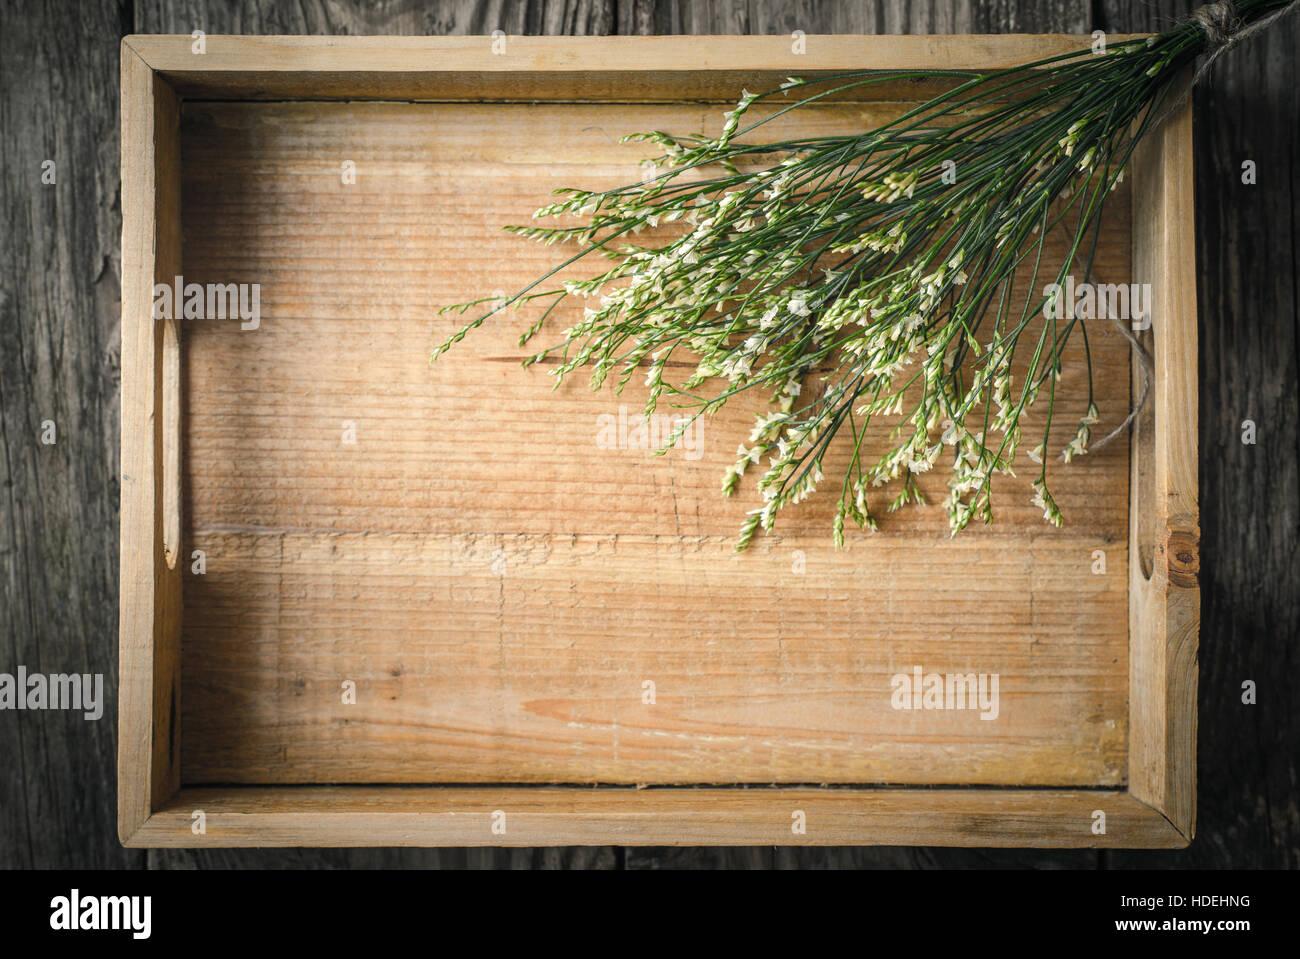 Holztablett mit Blumen Draufsicht Stockbild